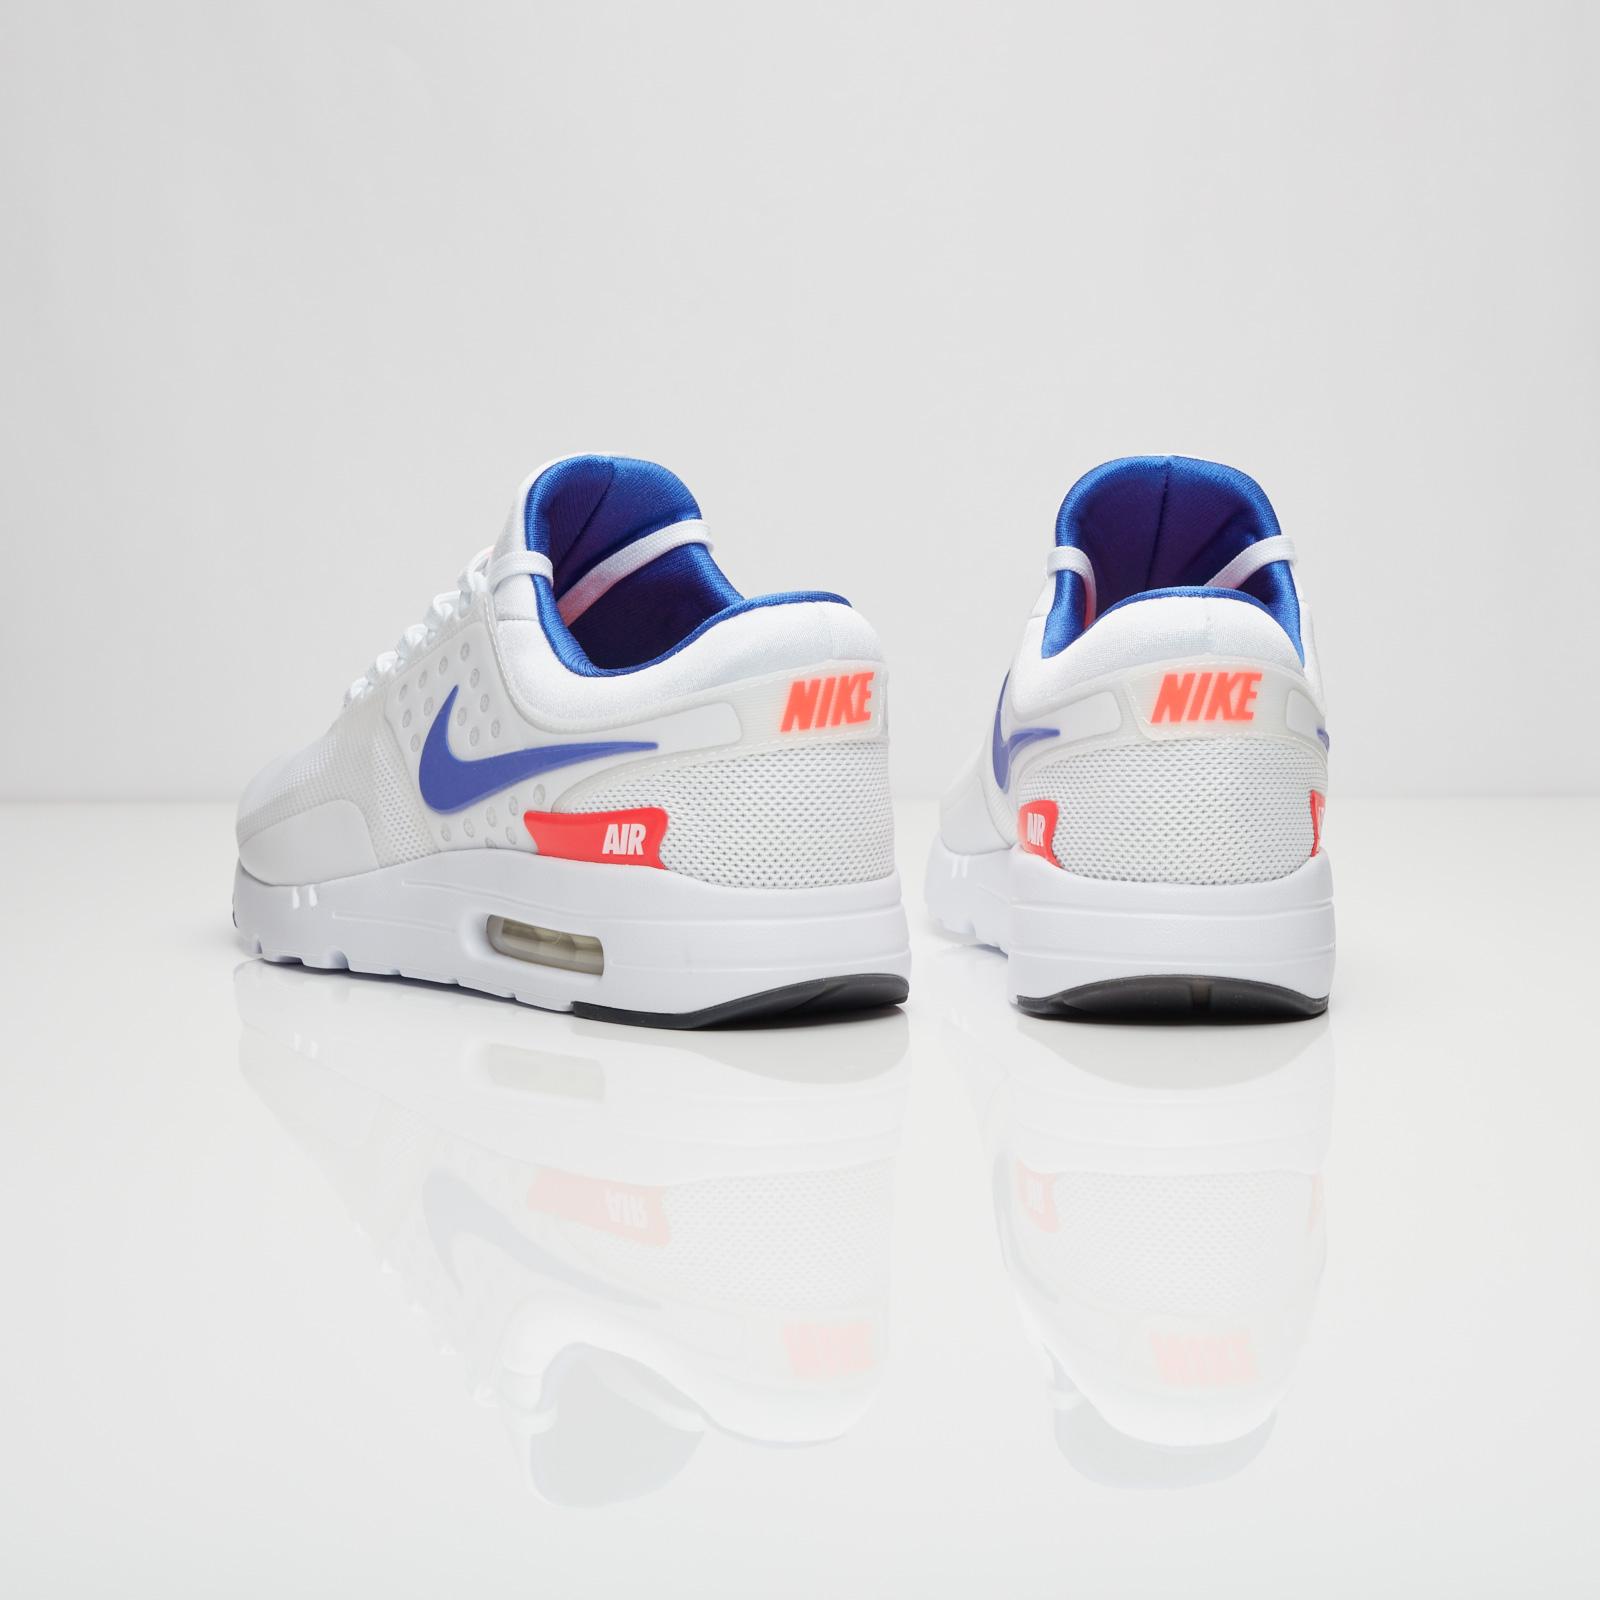 san francisco 964ab fea9a Nike Air Max Zero QS - 789695-105 - Sneakersnstuff   sneakers   streetwear  online since 1999